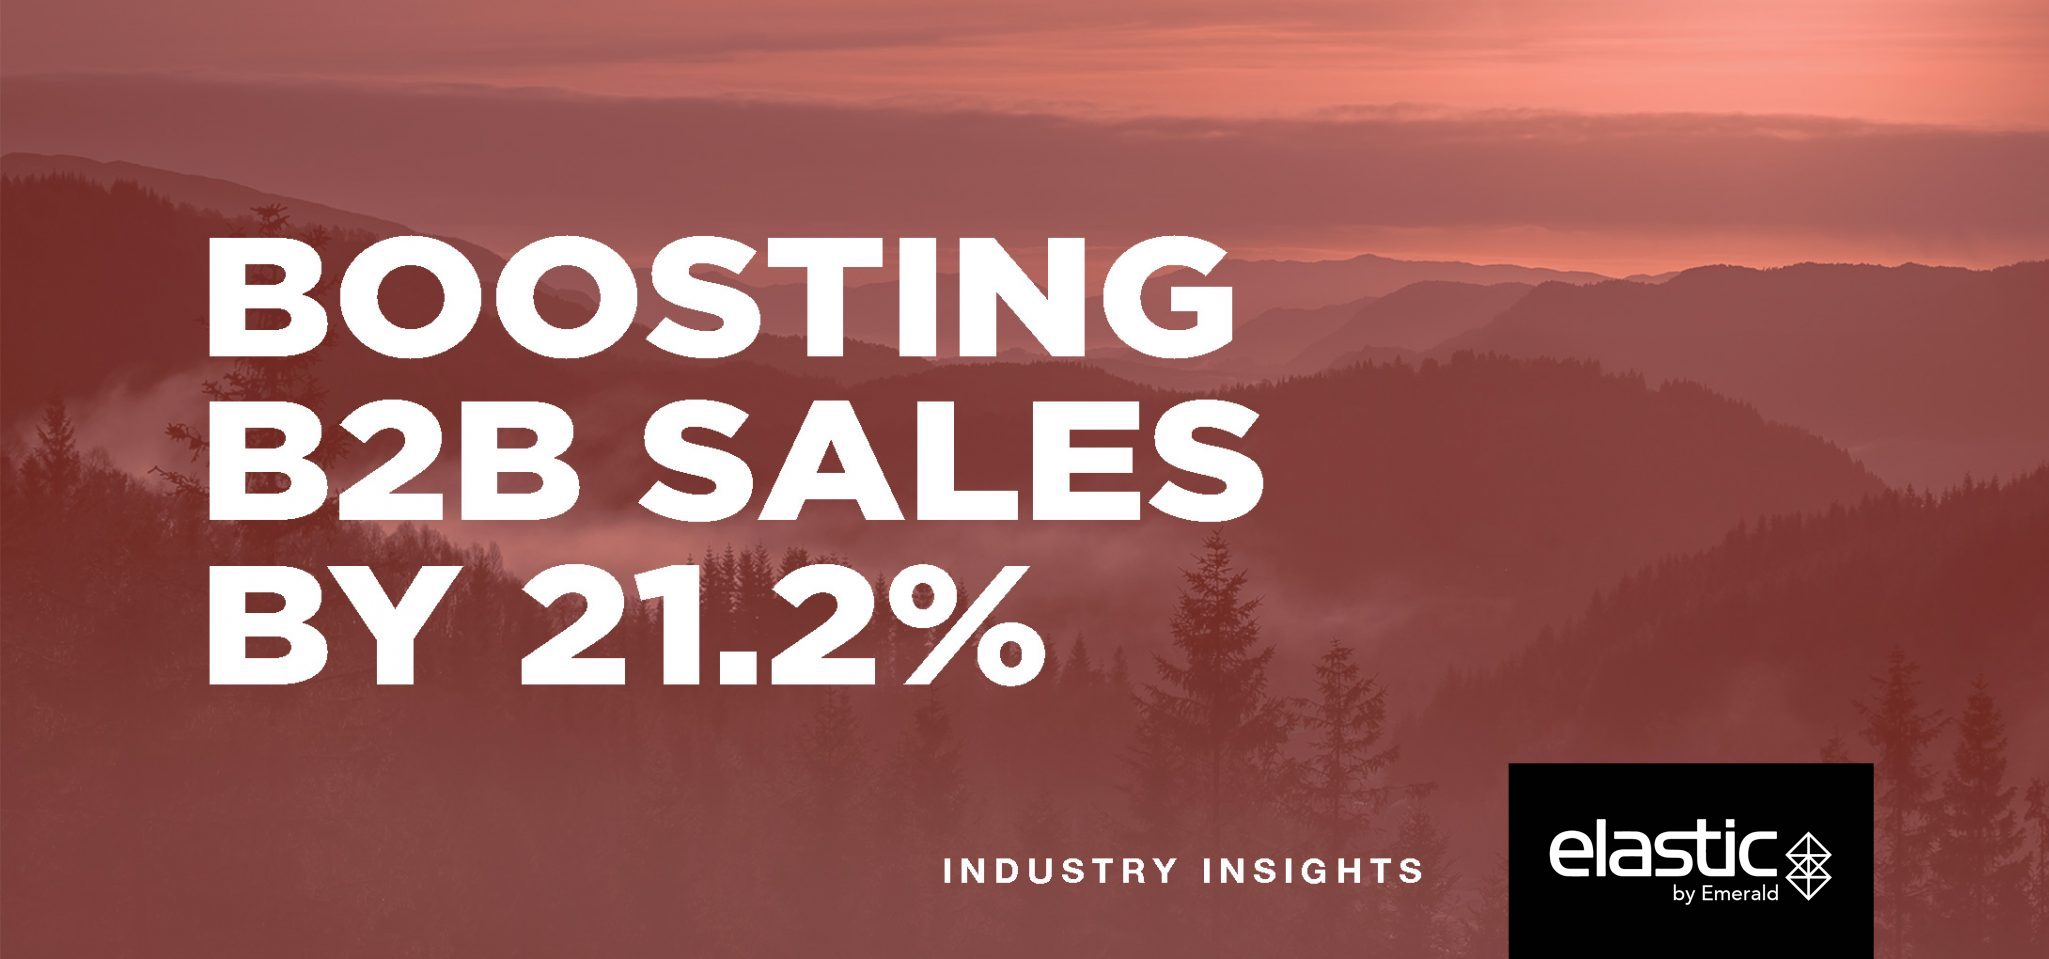 Boosting-B2B-Sales-Header